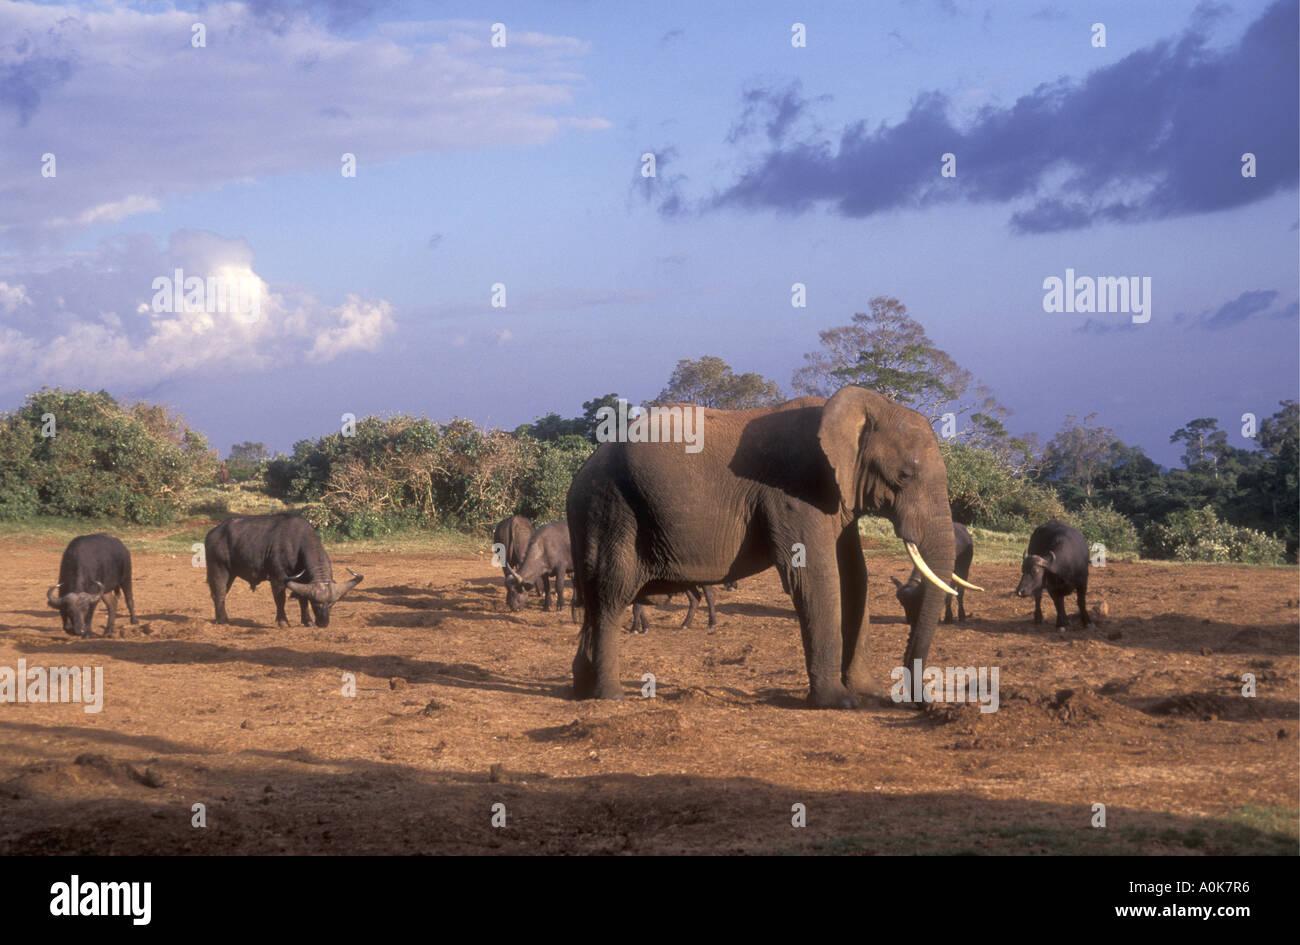 Elefante e buffalo a Salt Lick nel Parco nazionale di Aberdares Kenya Africa orientale Immagini Stock